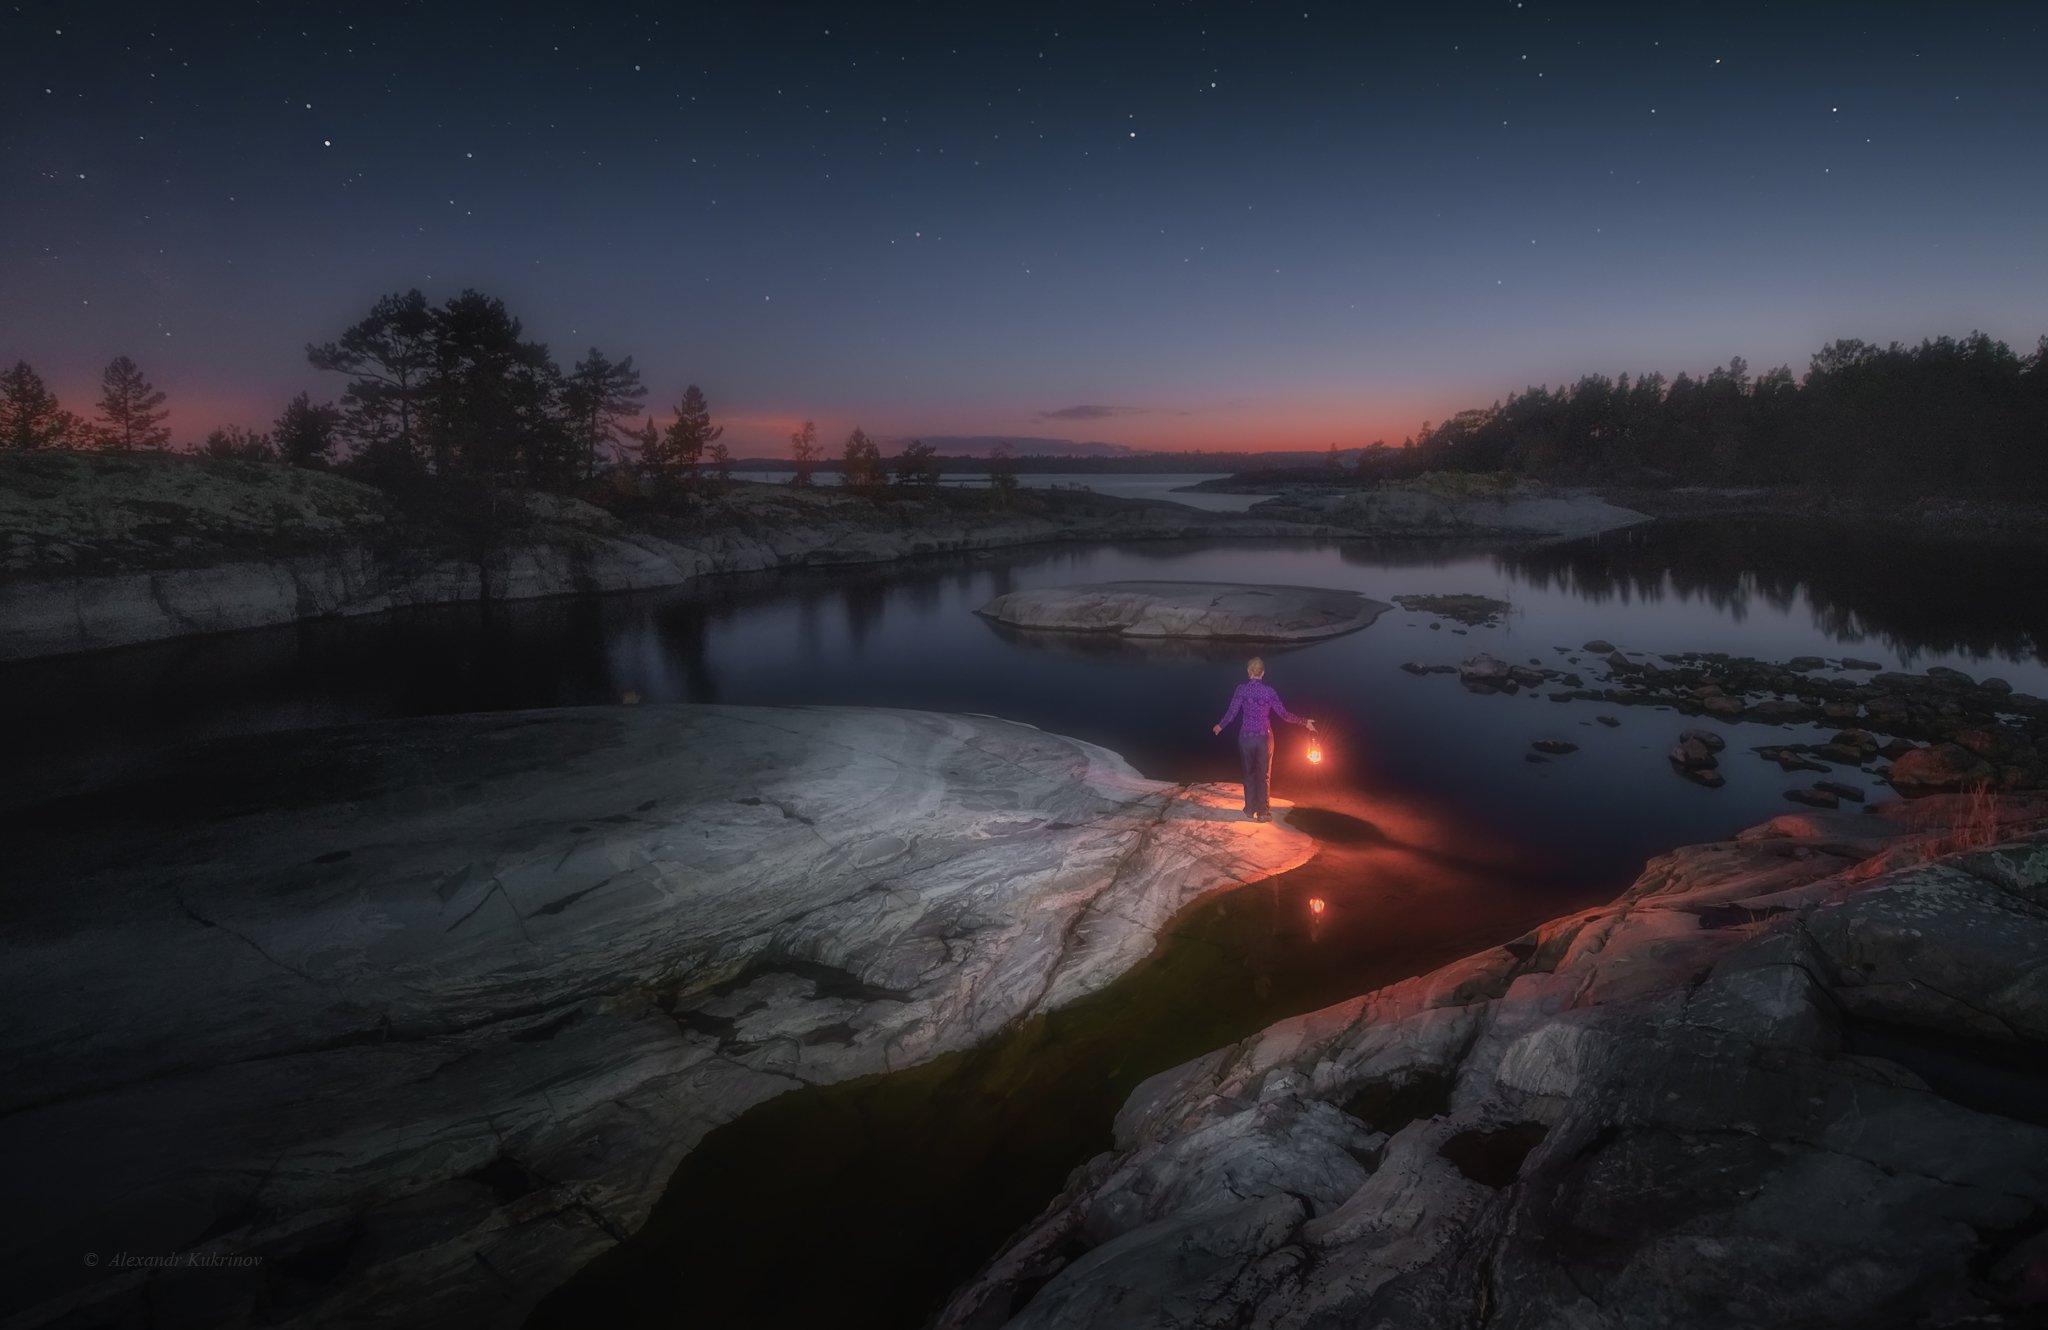 ладога, ночь, звёзды, пейзаж, Александр Кукринов